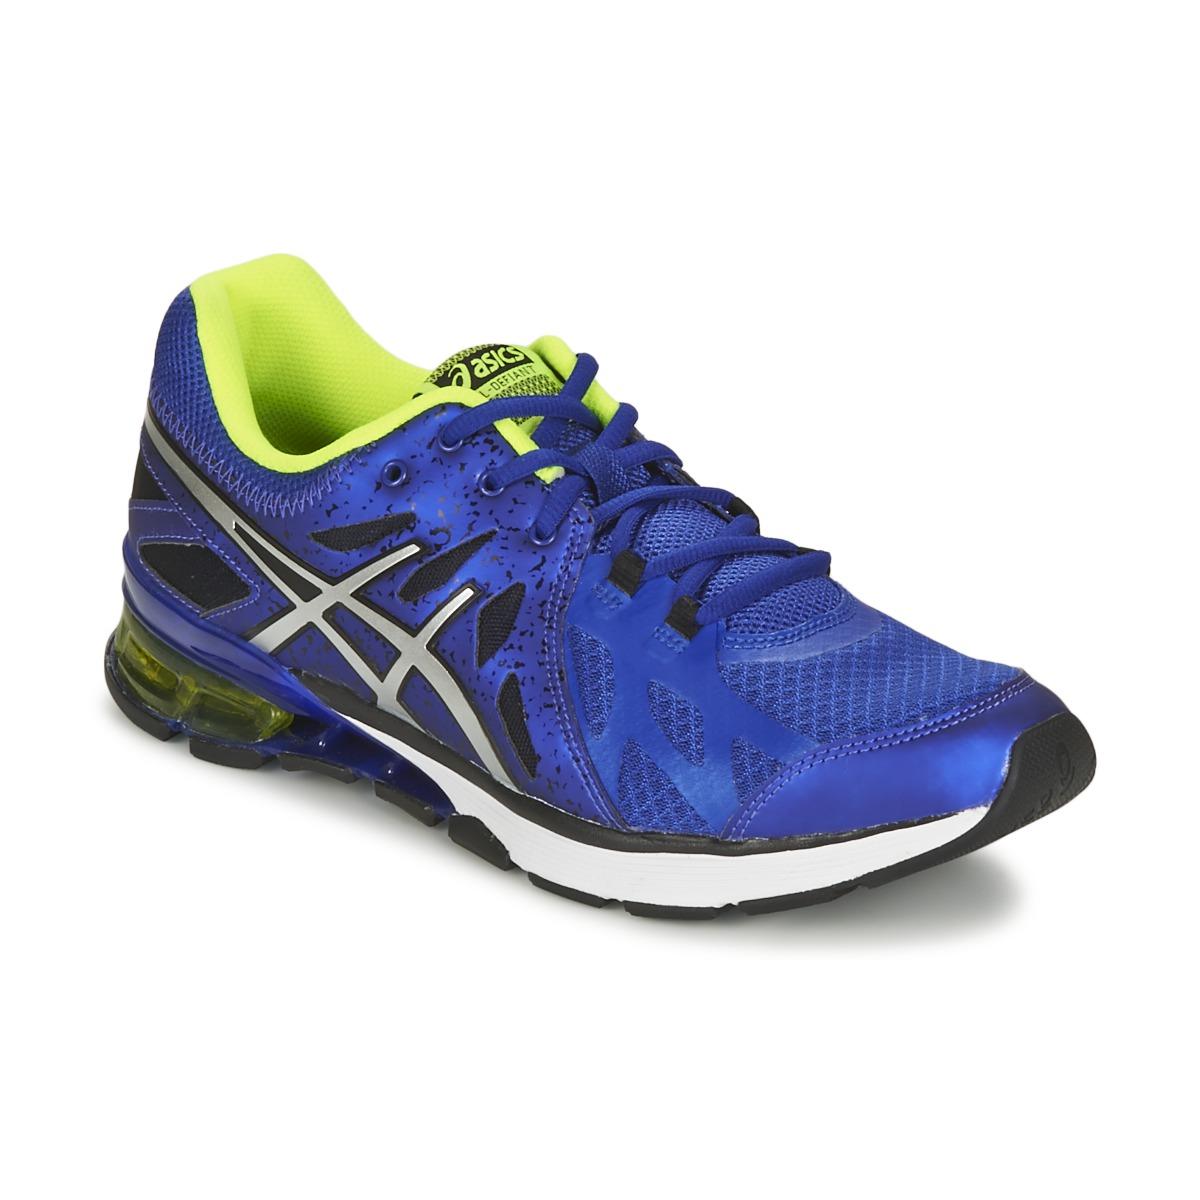 Fitness Asics GEL-DEFIANT Blu